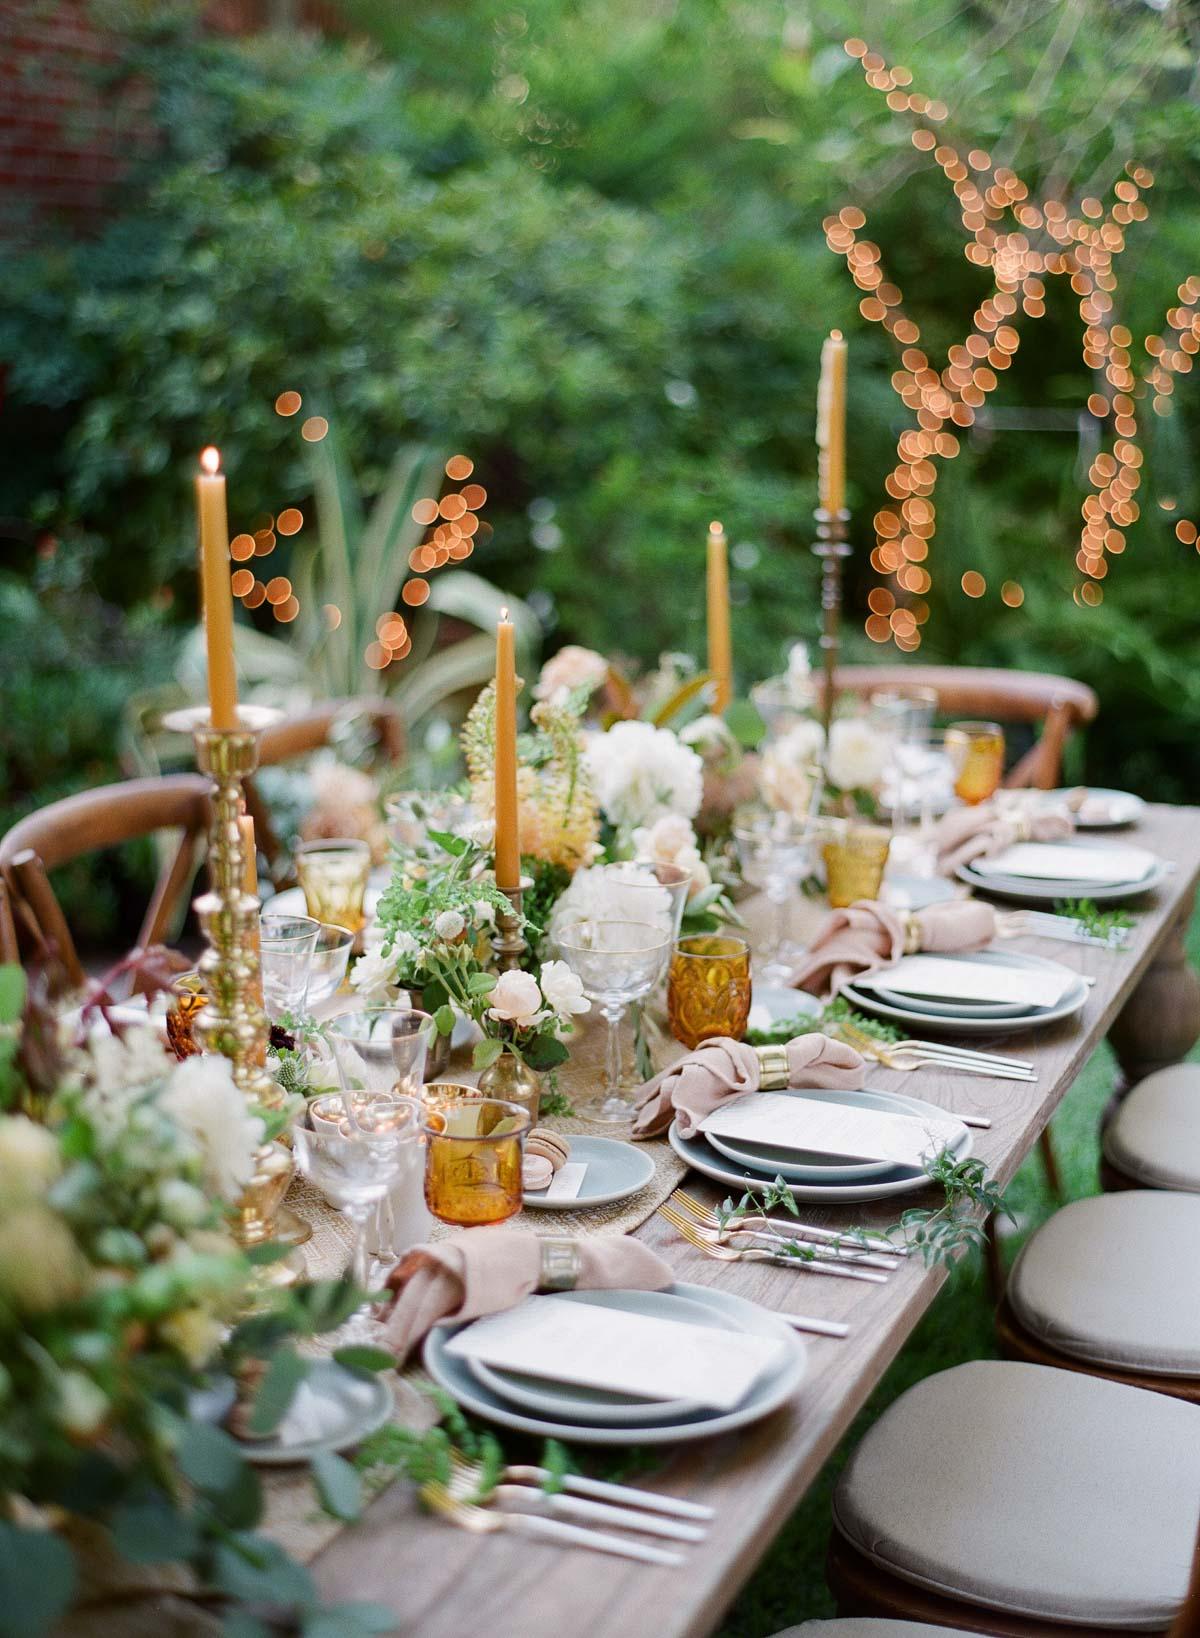 Lauren_Travis_Backyard_California_Wedding (c) Greg_Finck-122.jpg